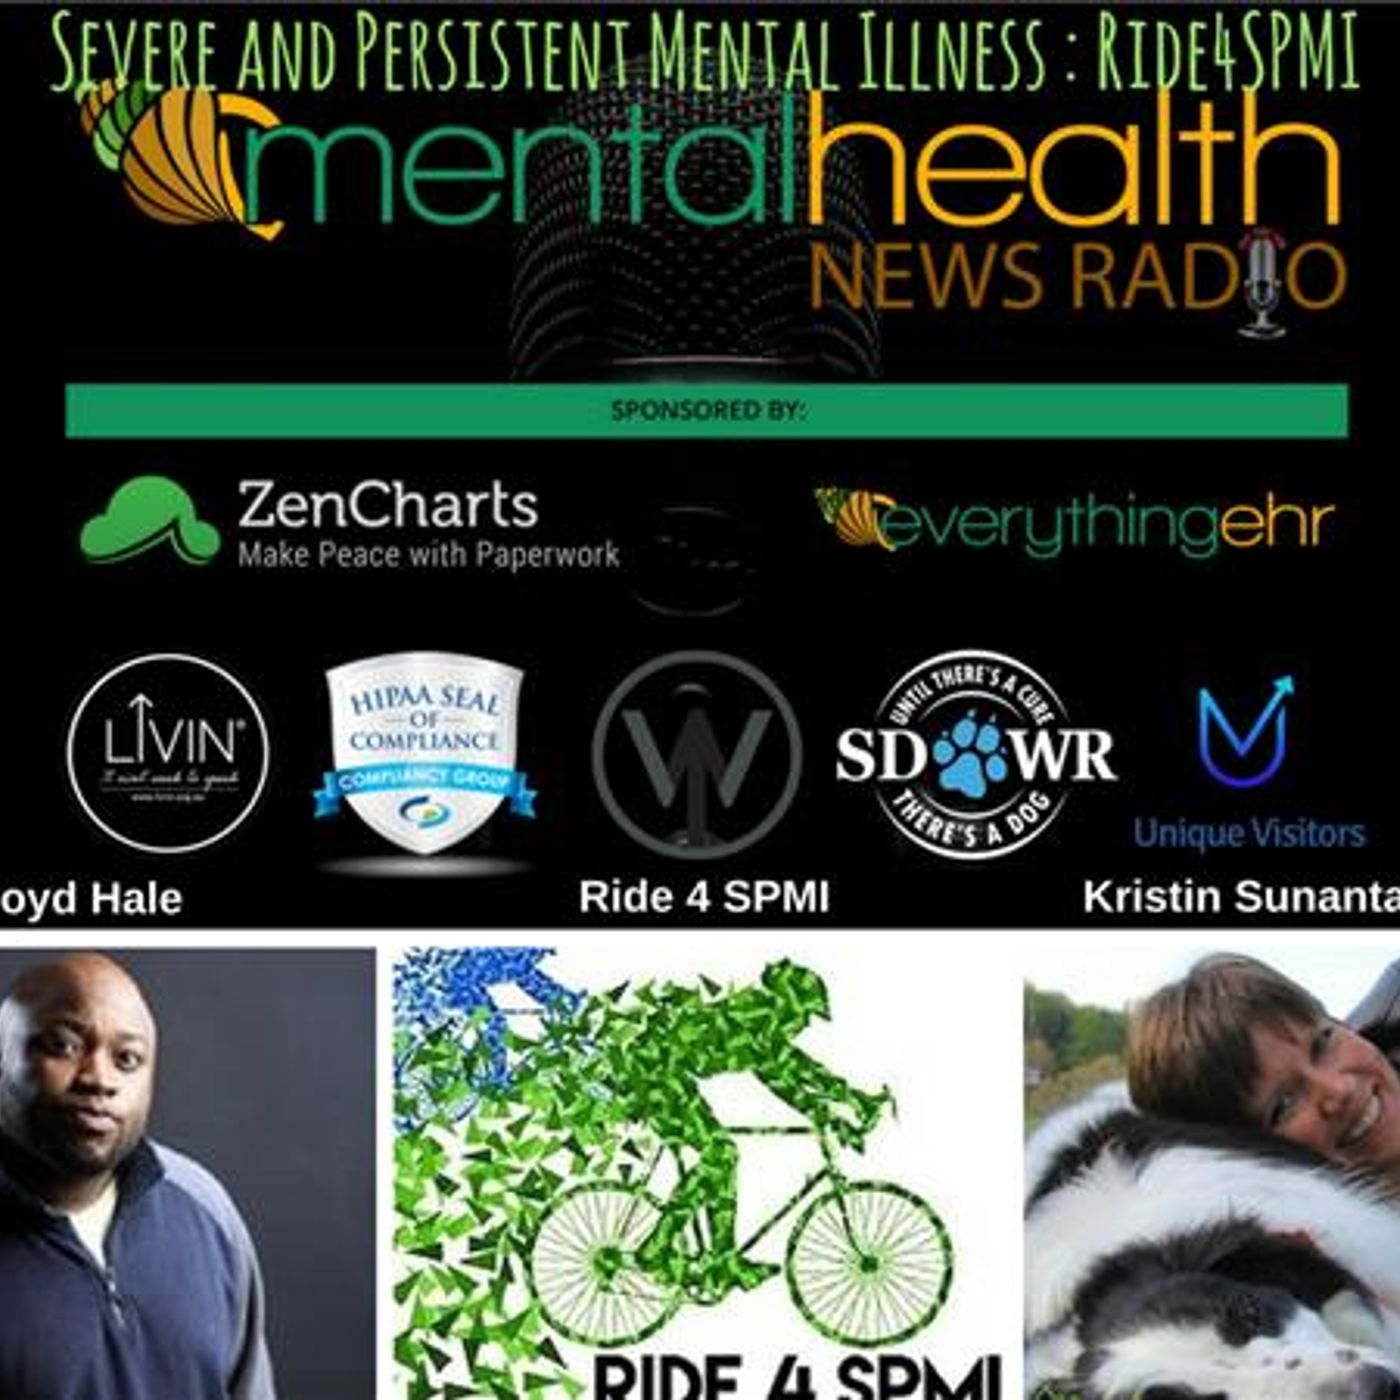 Mental Health News Radio - Severe and Persistent Mental Illness with Lloyd Hale: Ride4SPMI